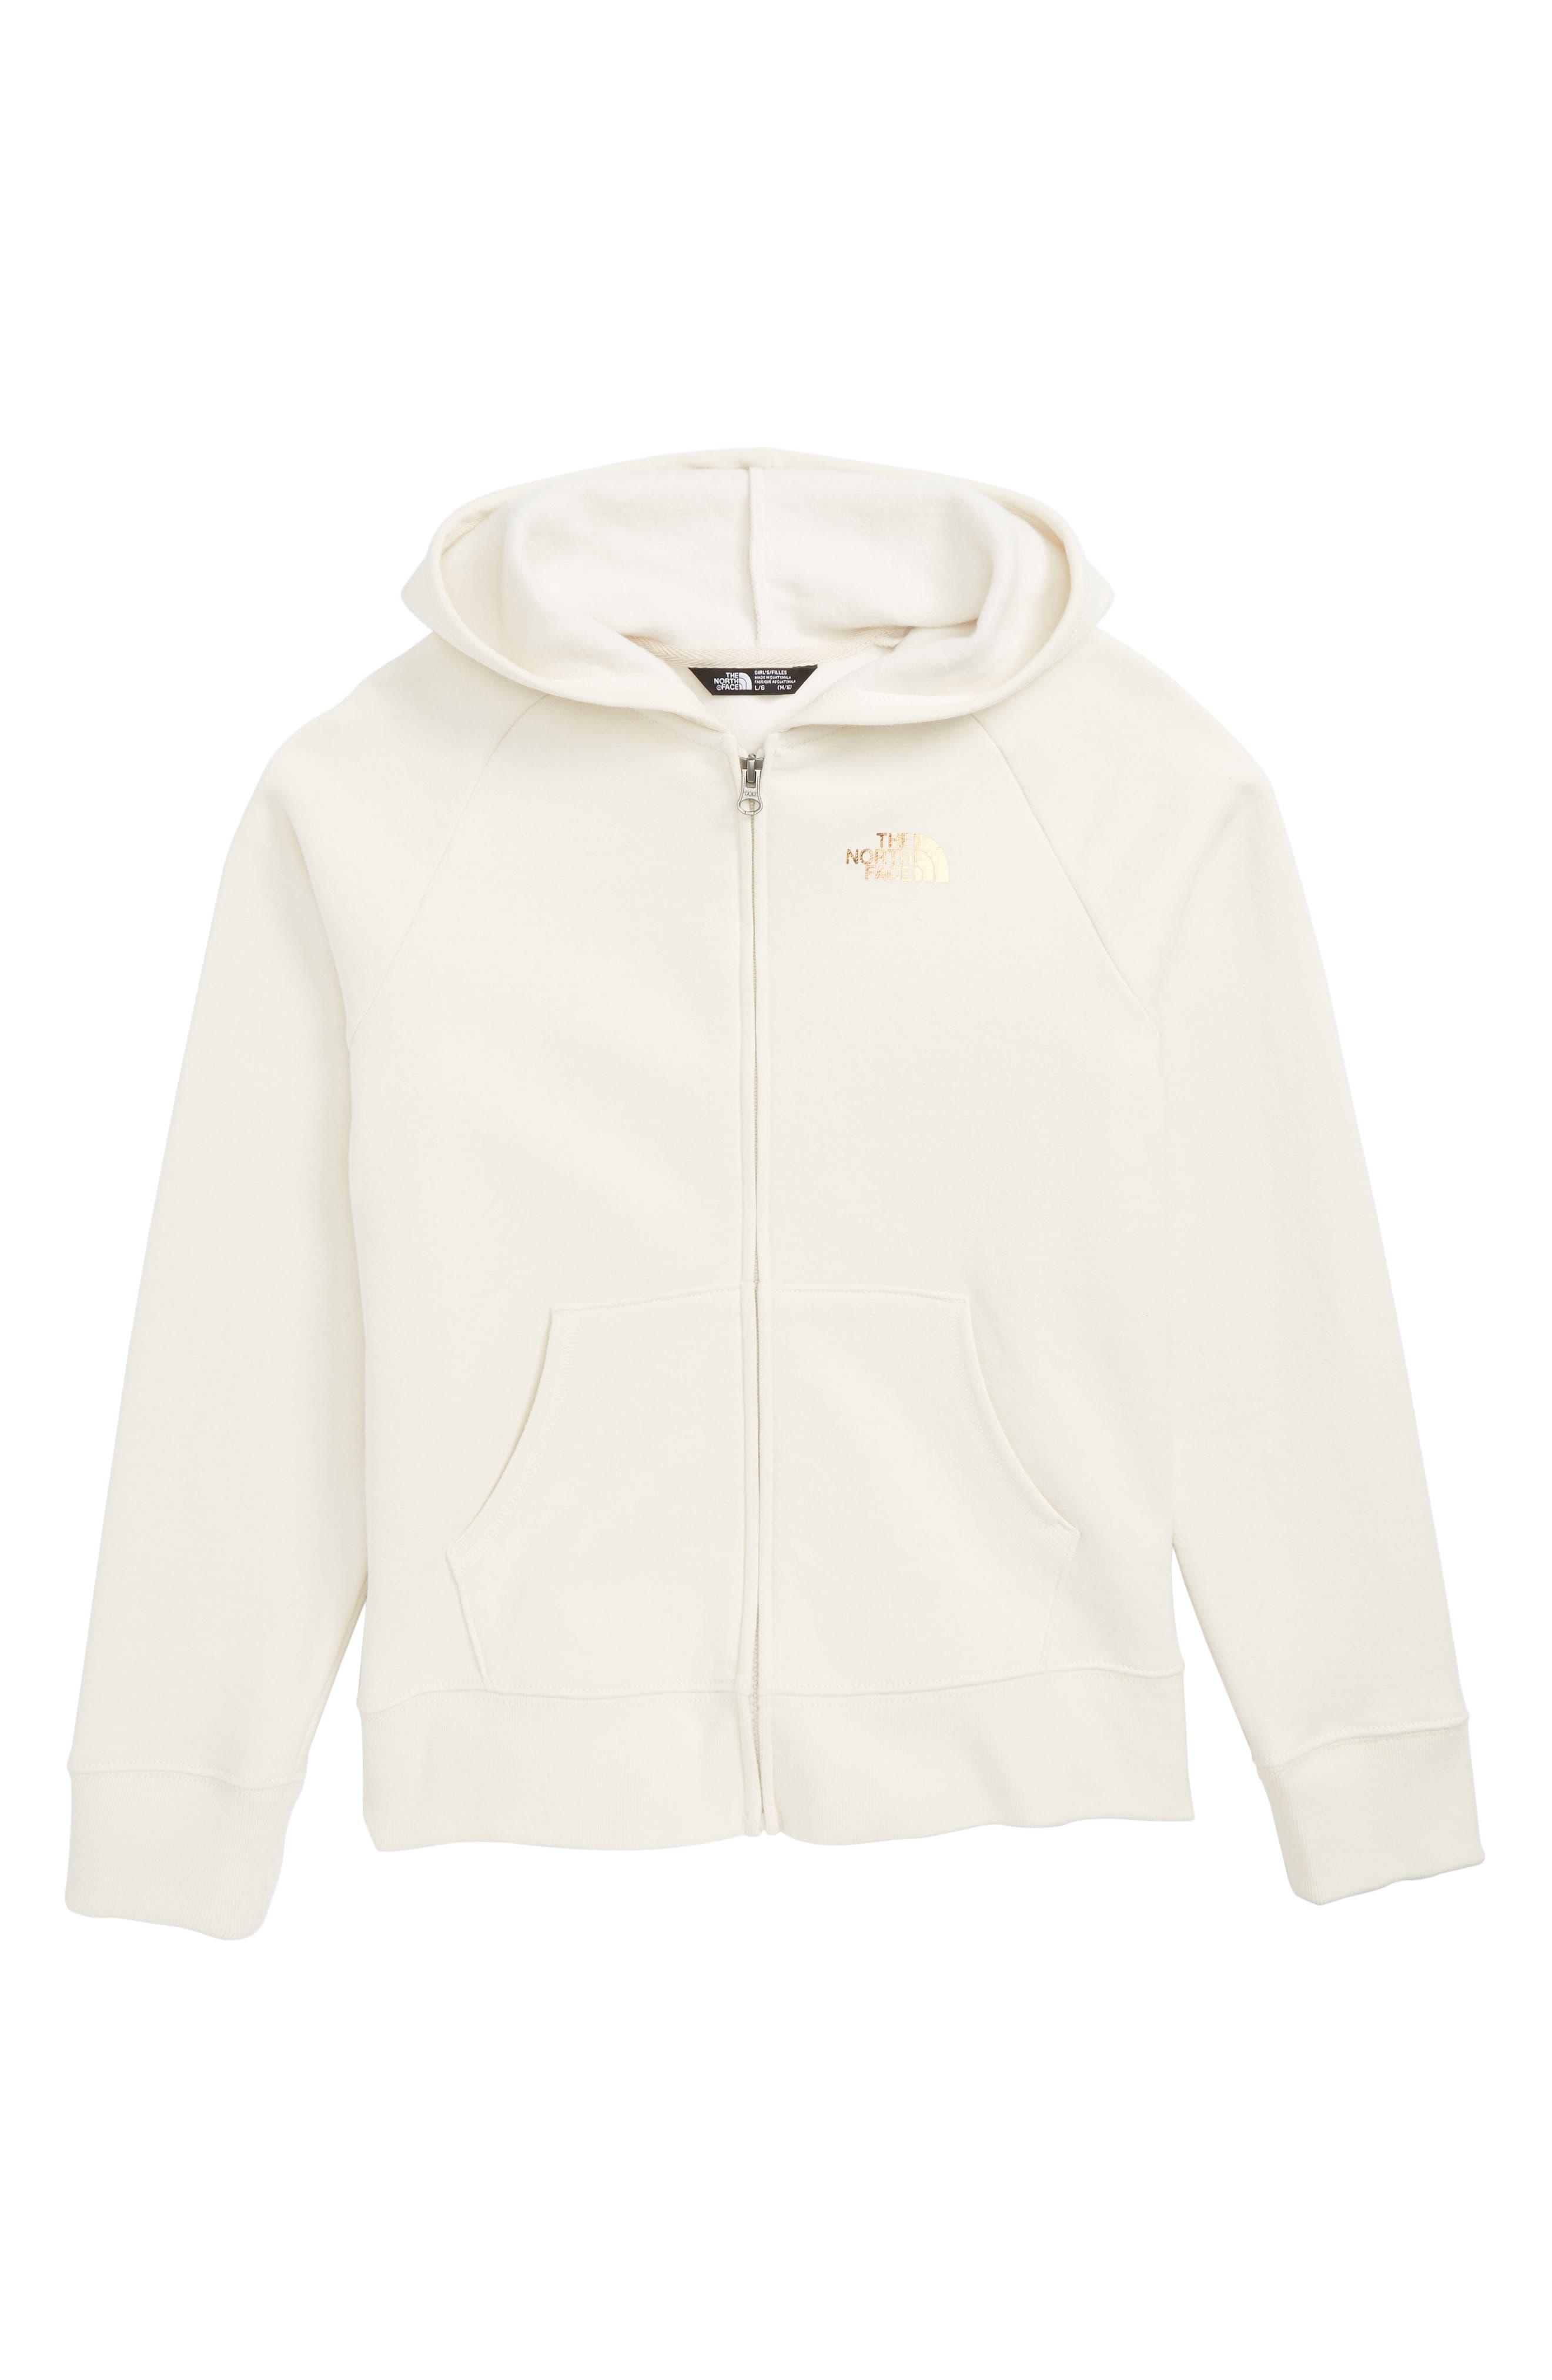 Logowear Full Zip Hoodie,                             Main thumbnail 1, color,                             VINTAGE WHITE